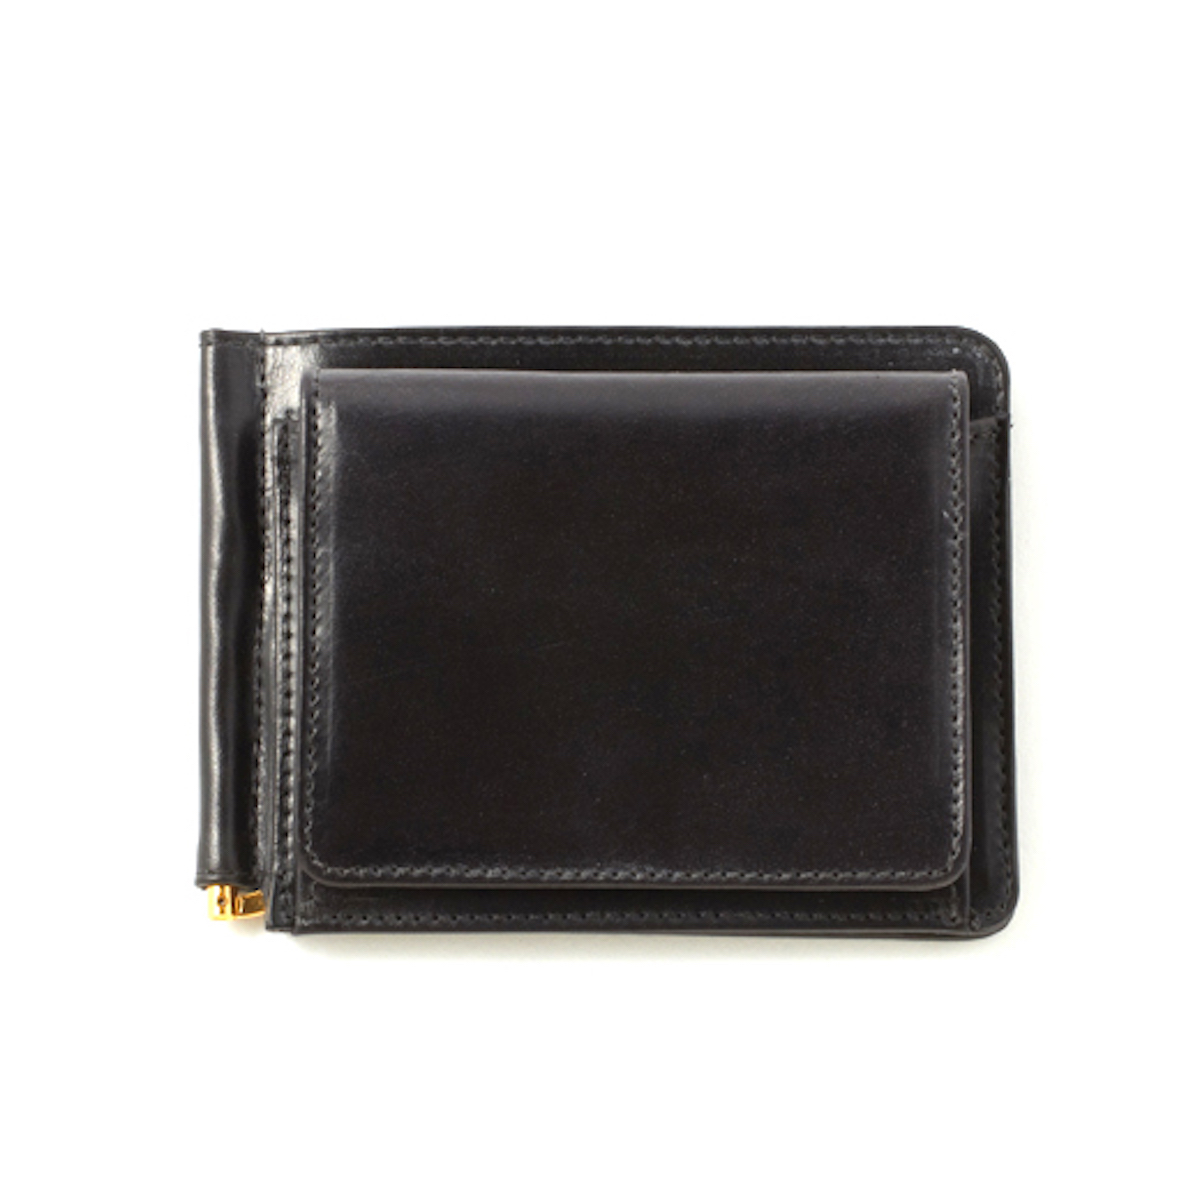 GLEN ROYAL / MONEY CLIP WITH COIN POCKET -NEW BLACK